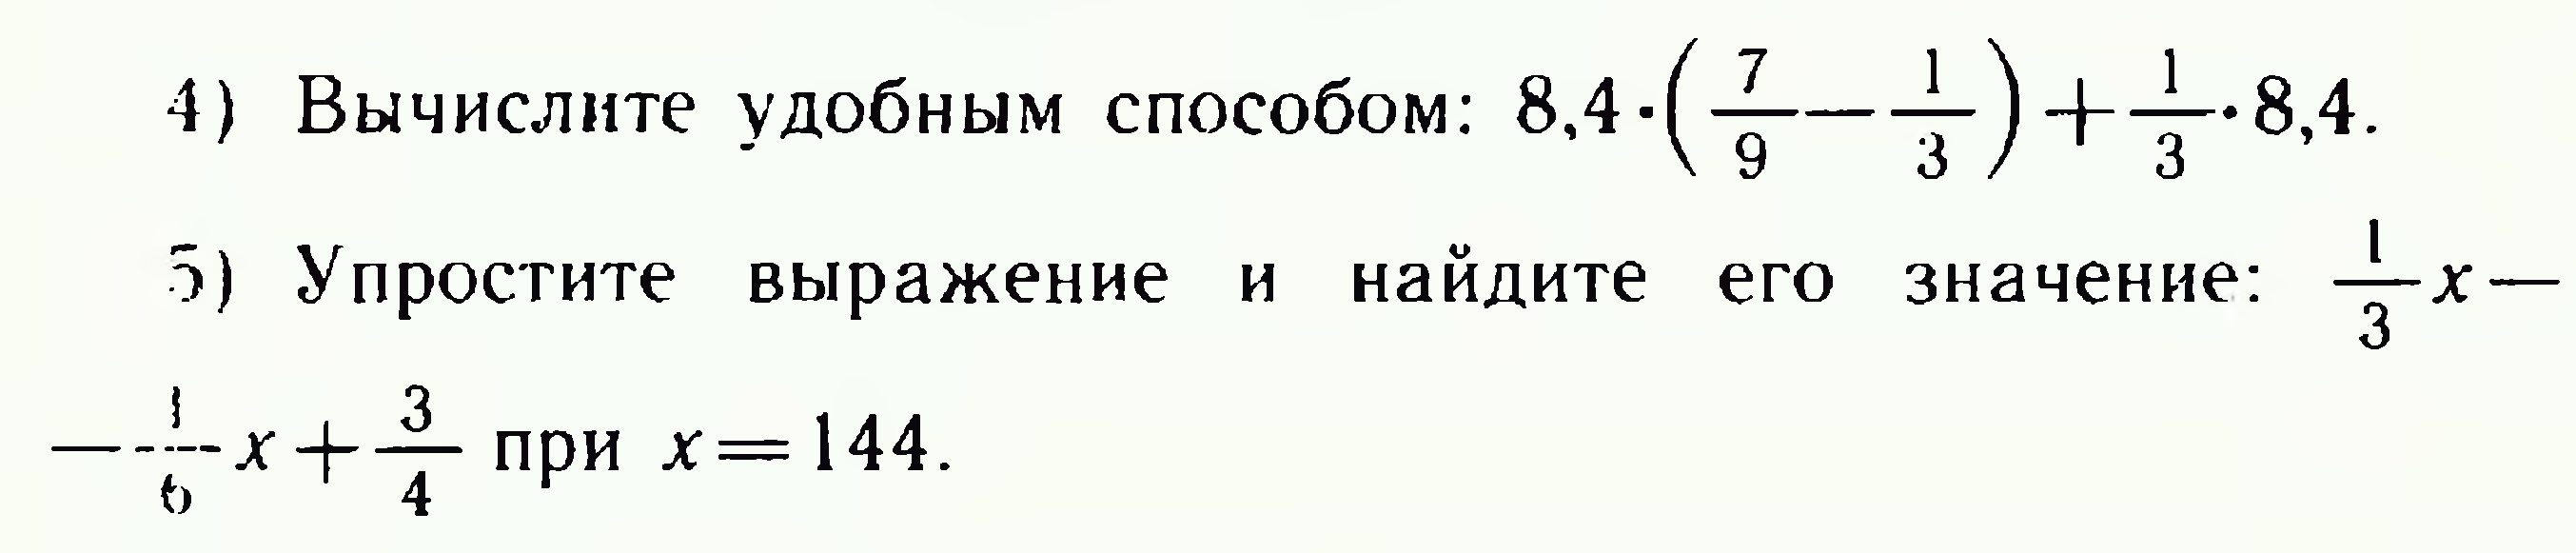 hello_html_m2fafca20.png